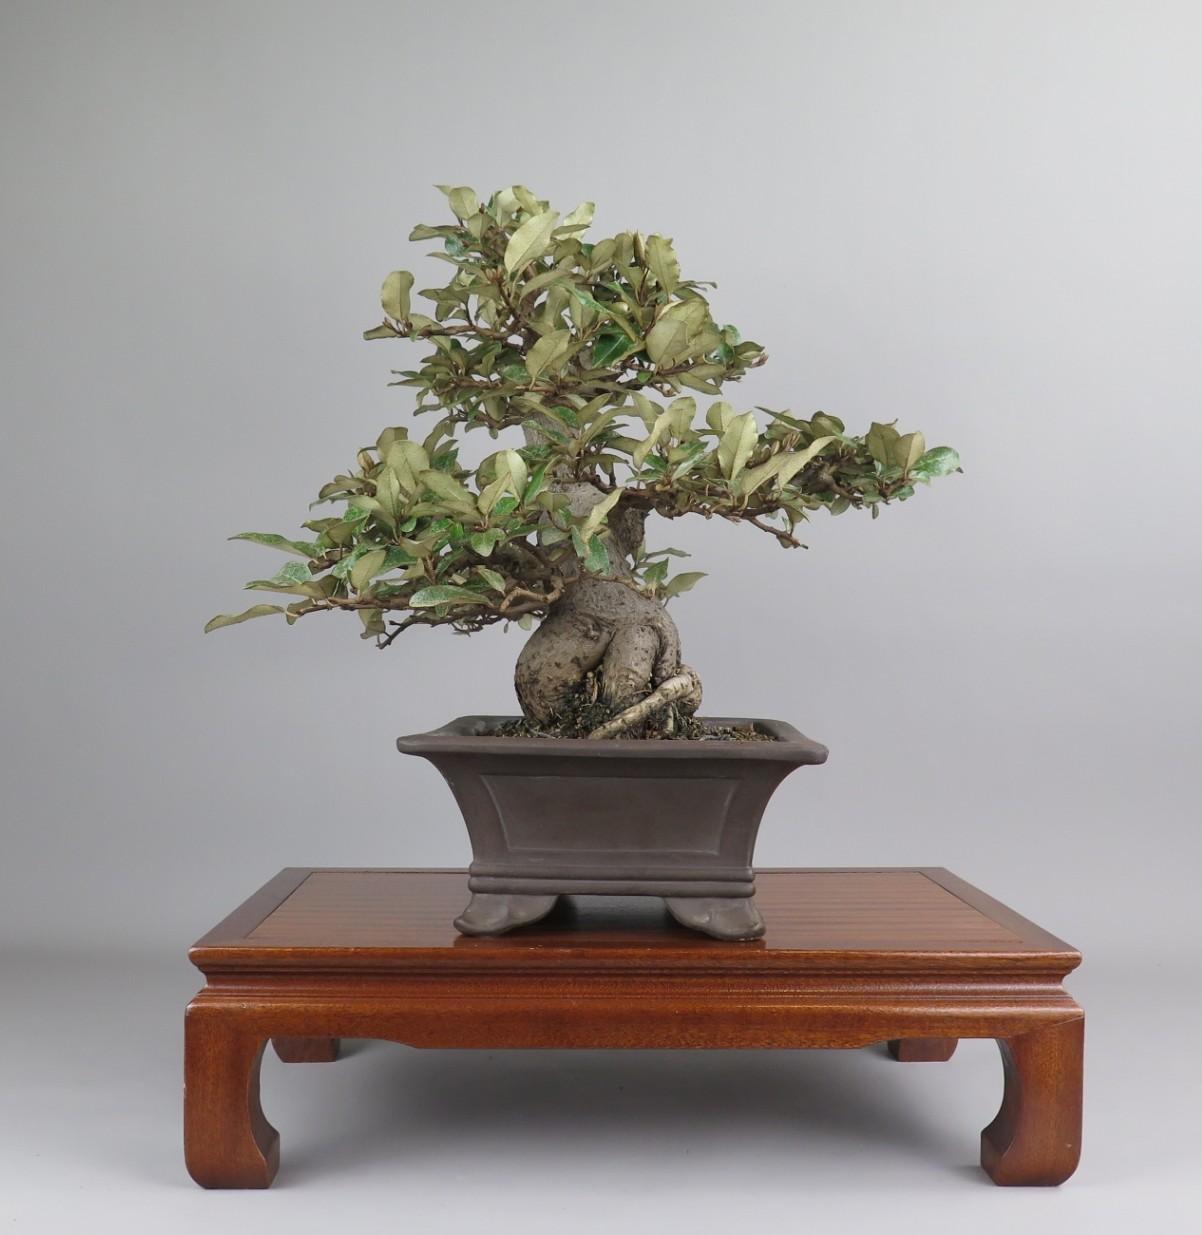 Bonsai de Eleagnus. Lateral izquierdo.